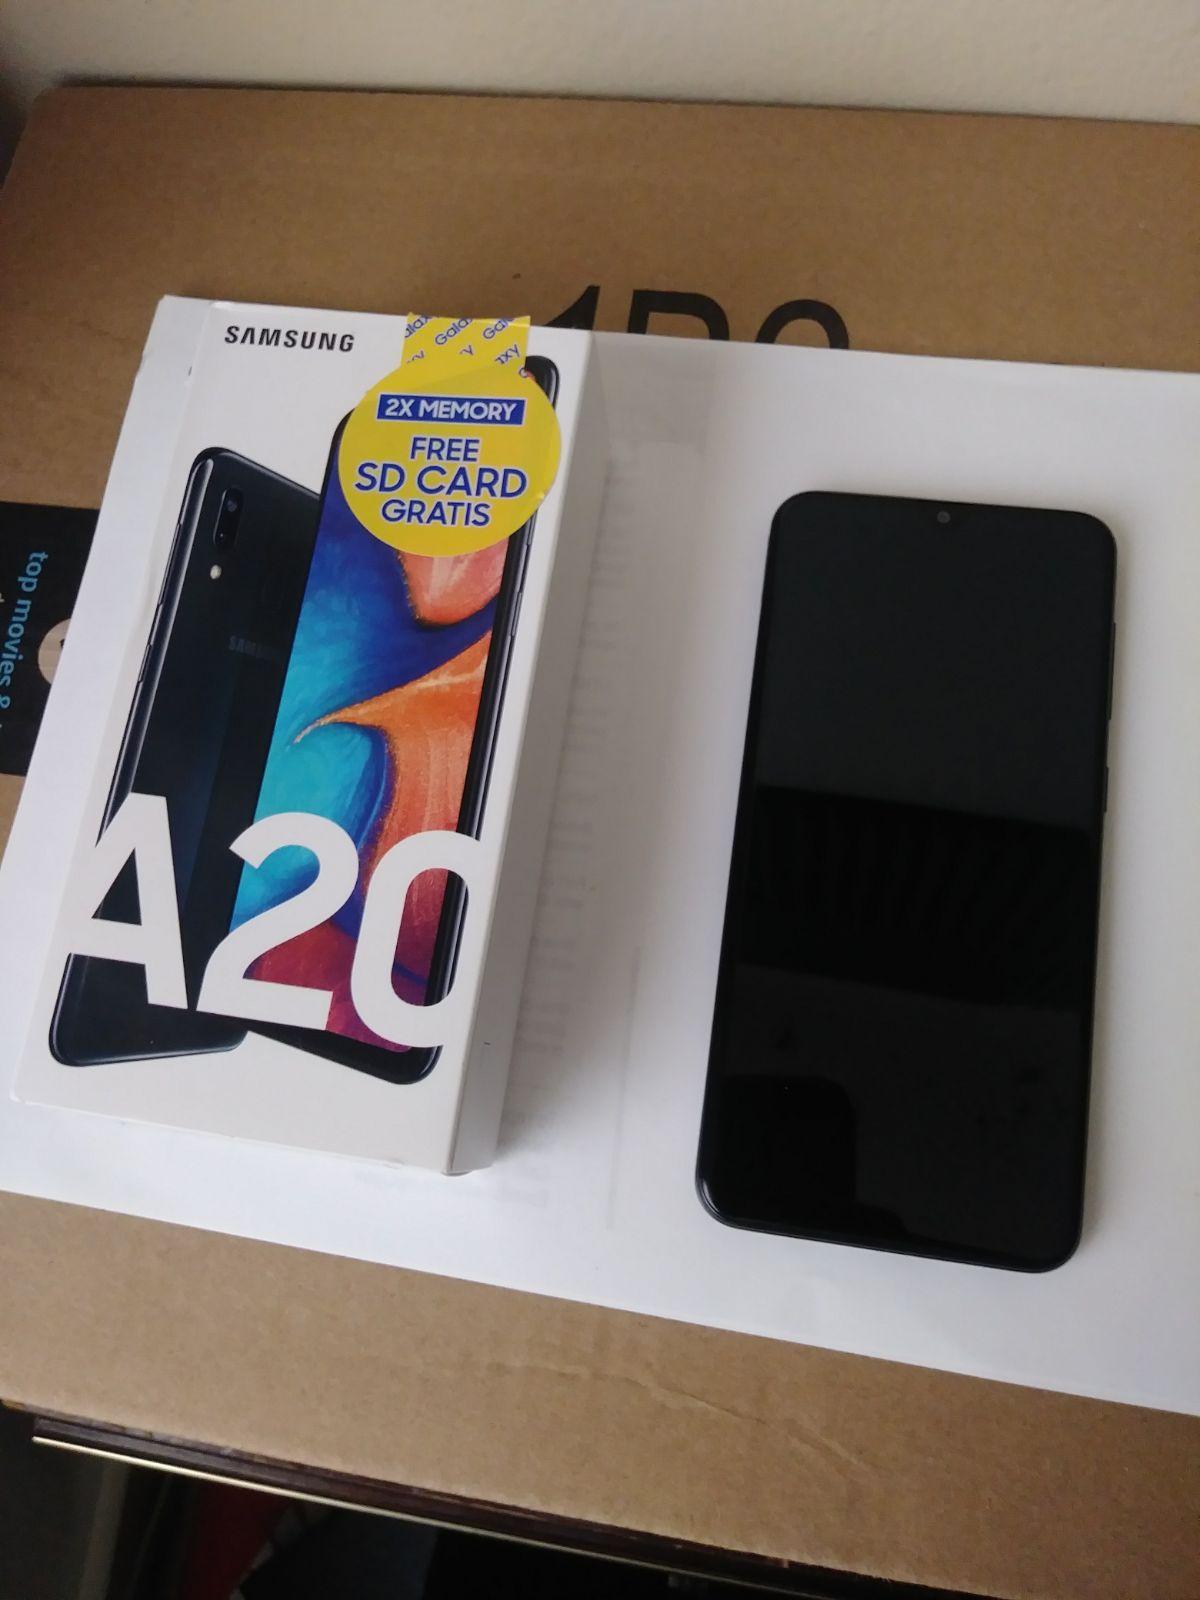 Samsung Galaxy A20 Unlocked On Mercari Boost Mobile Phone Mobile Phone